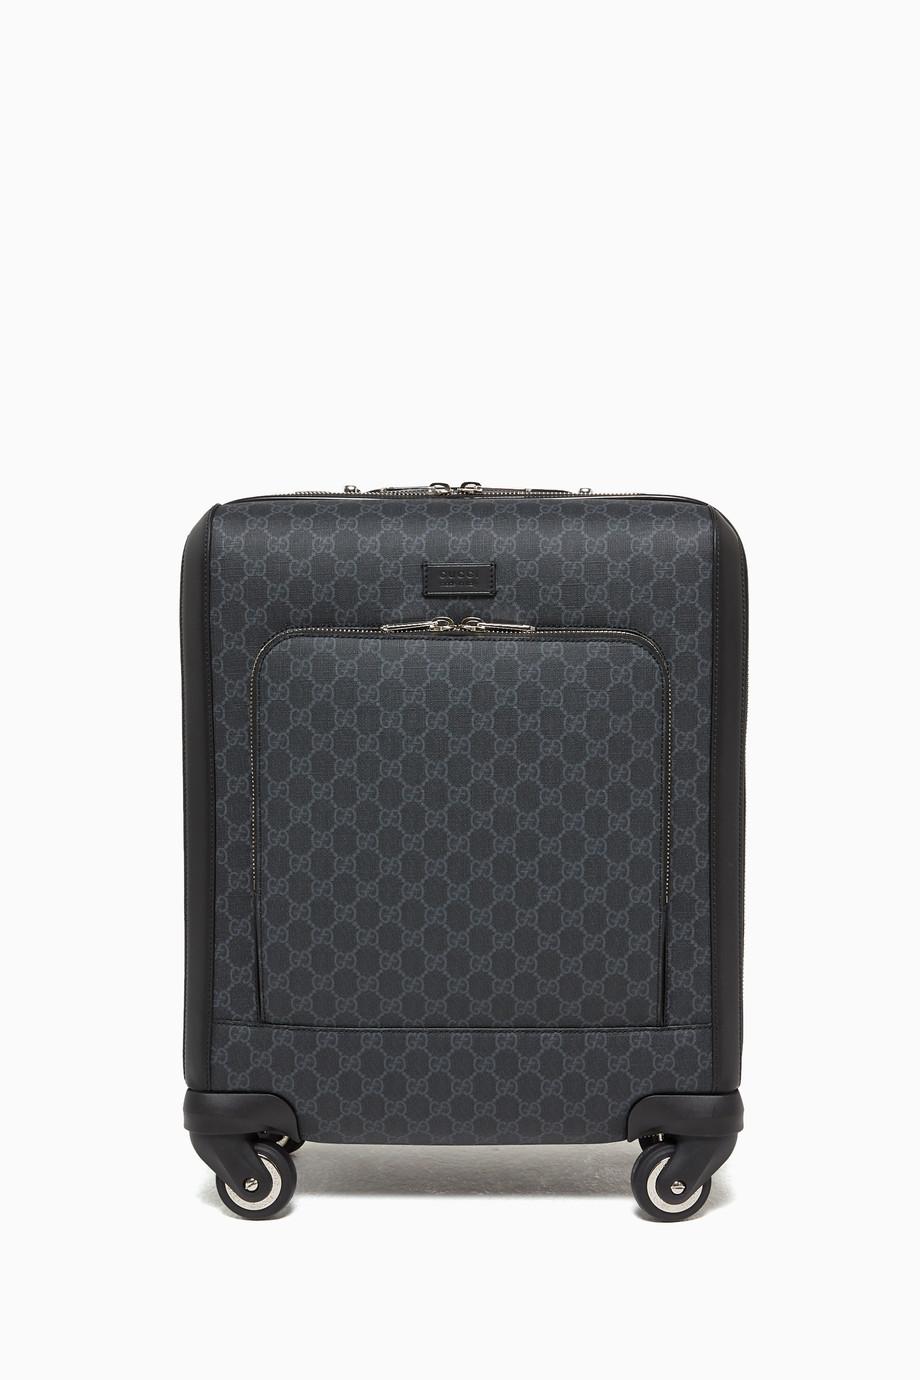 1303110d08 Shop Gucci Black GG Supreme Leather-Trimmed Suitcase for Men | Ounass